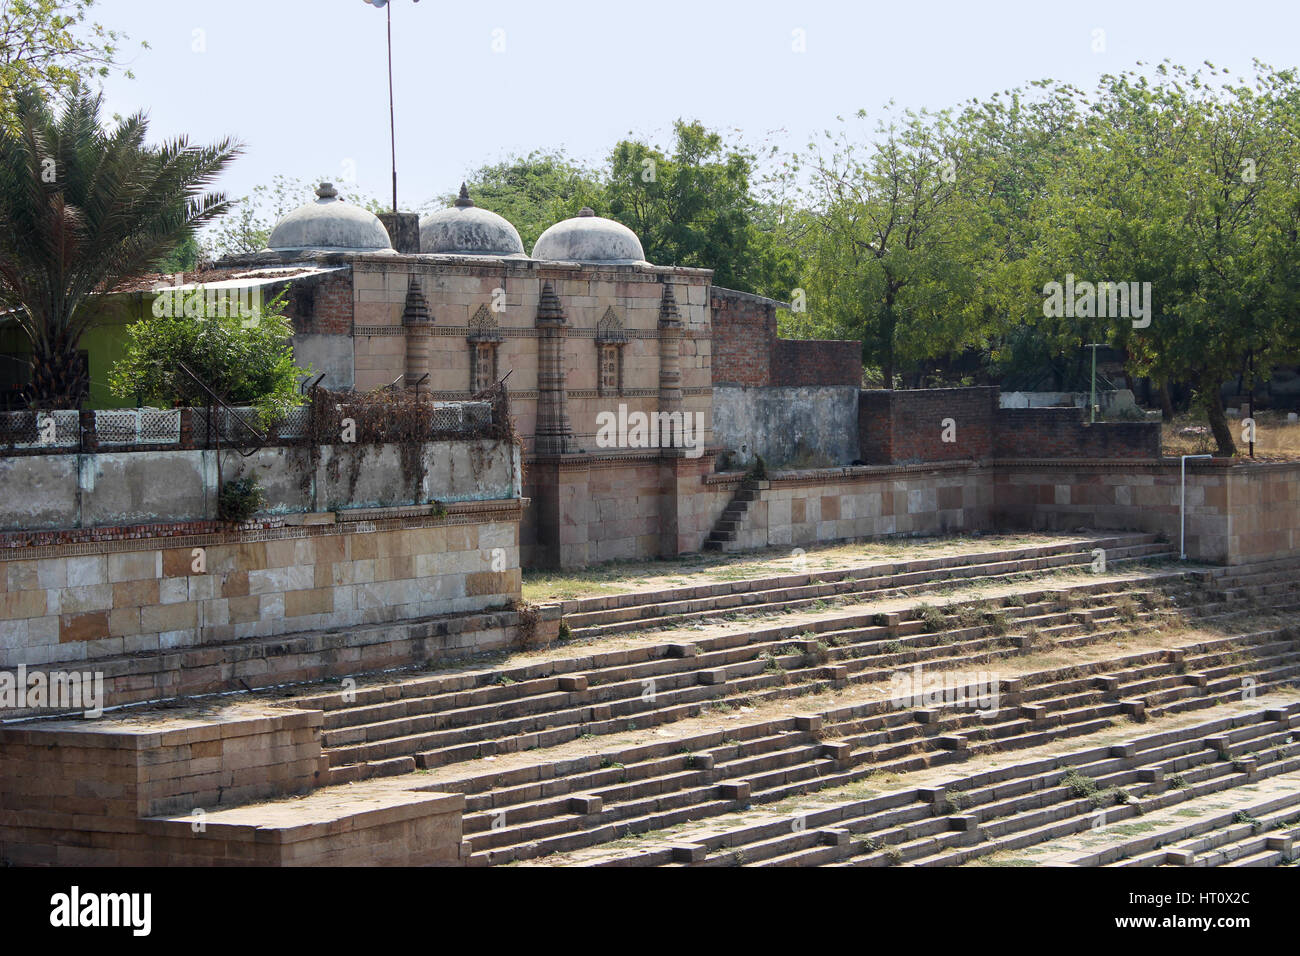 Building around a stepped tank. Sarkhej Roza, Ahmedabad, Gujarat India - Stock Image